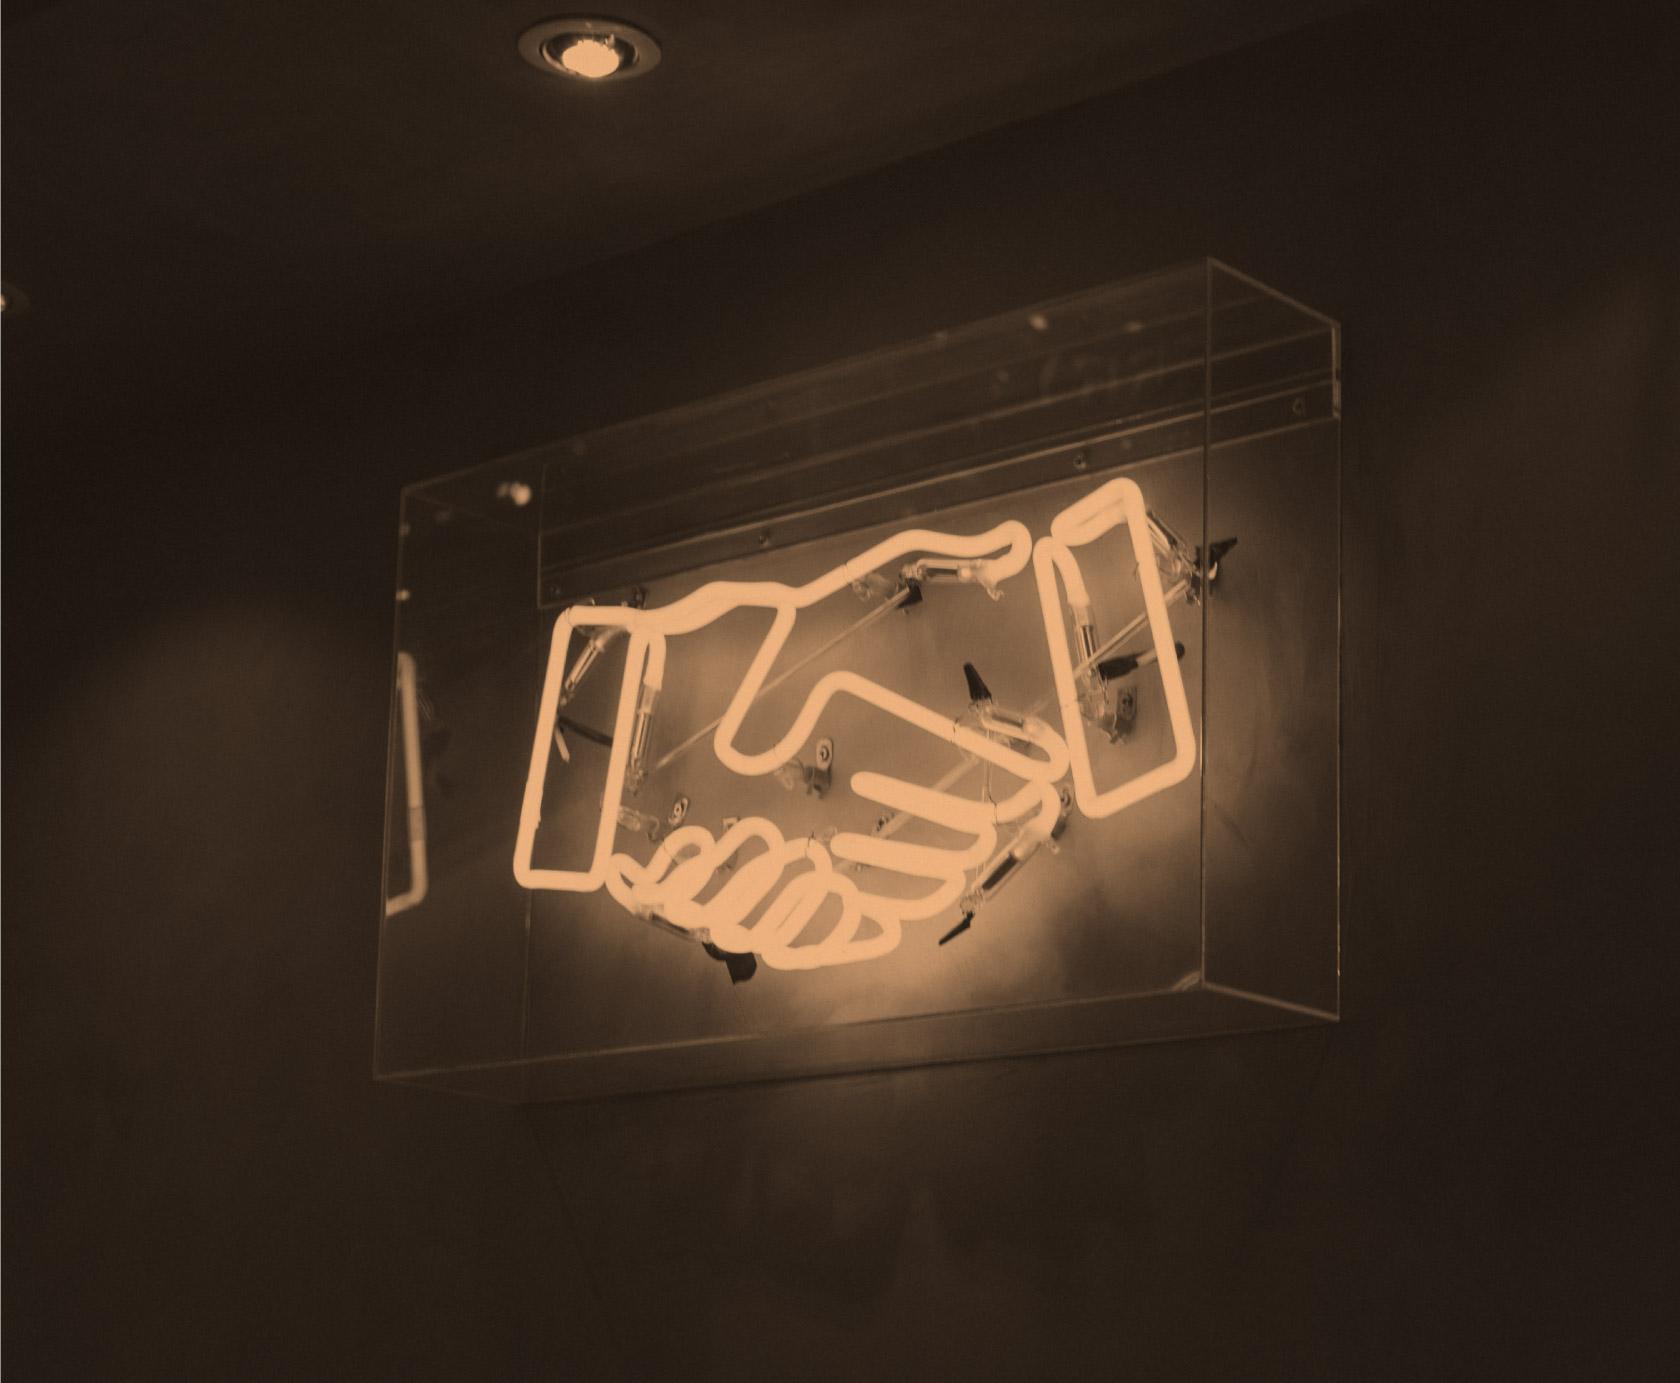 yellow neon sign of a handshake